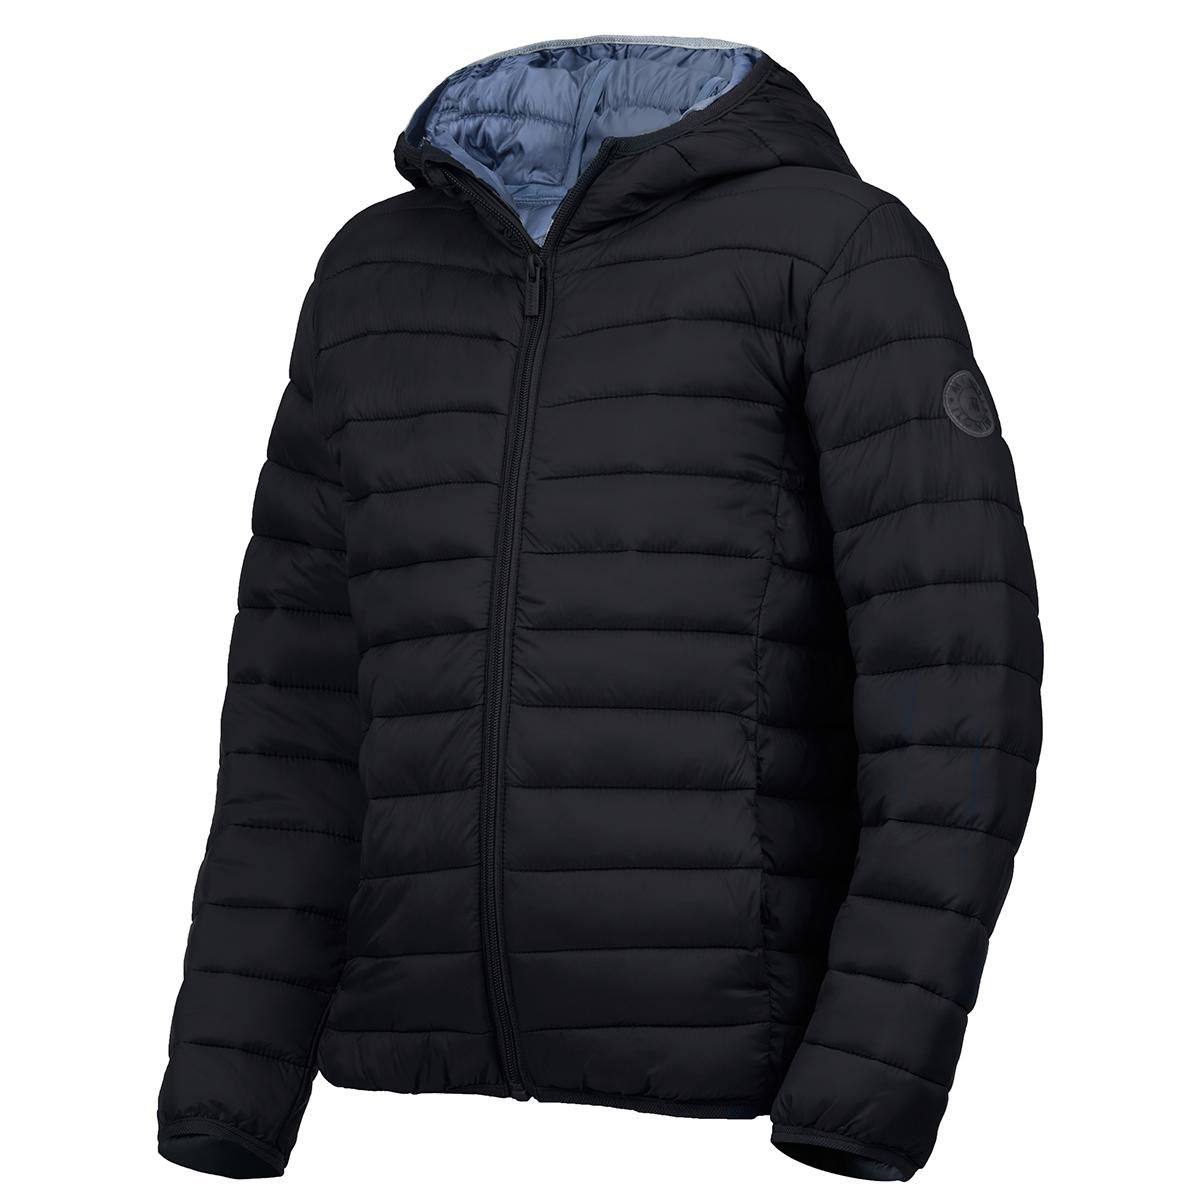 Minoti Little Boys' Basic Puffa Jacket - Black, 3-4